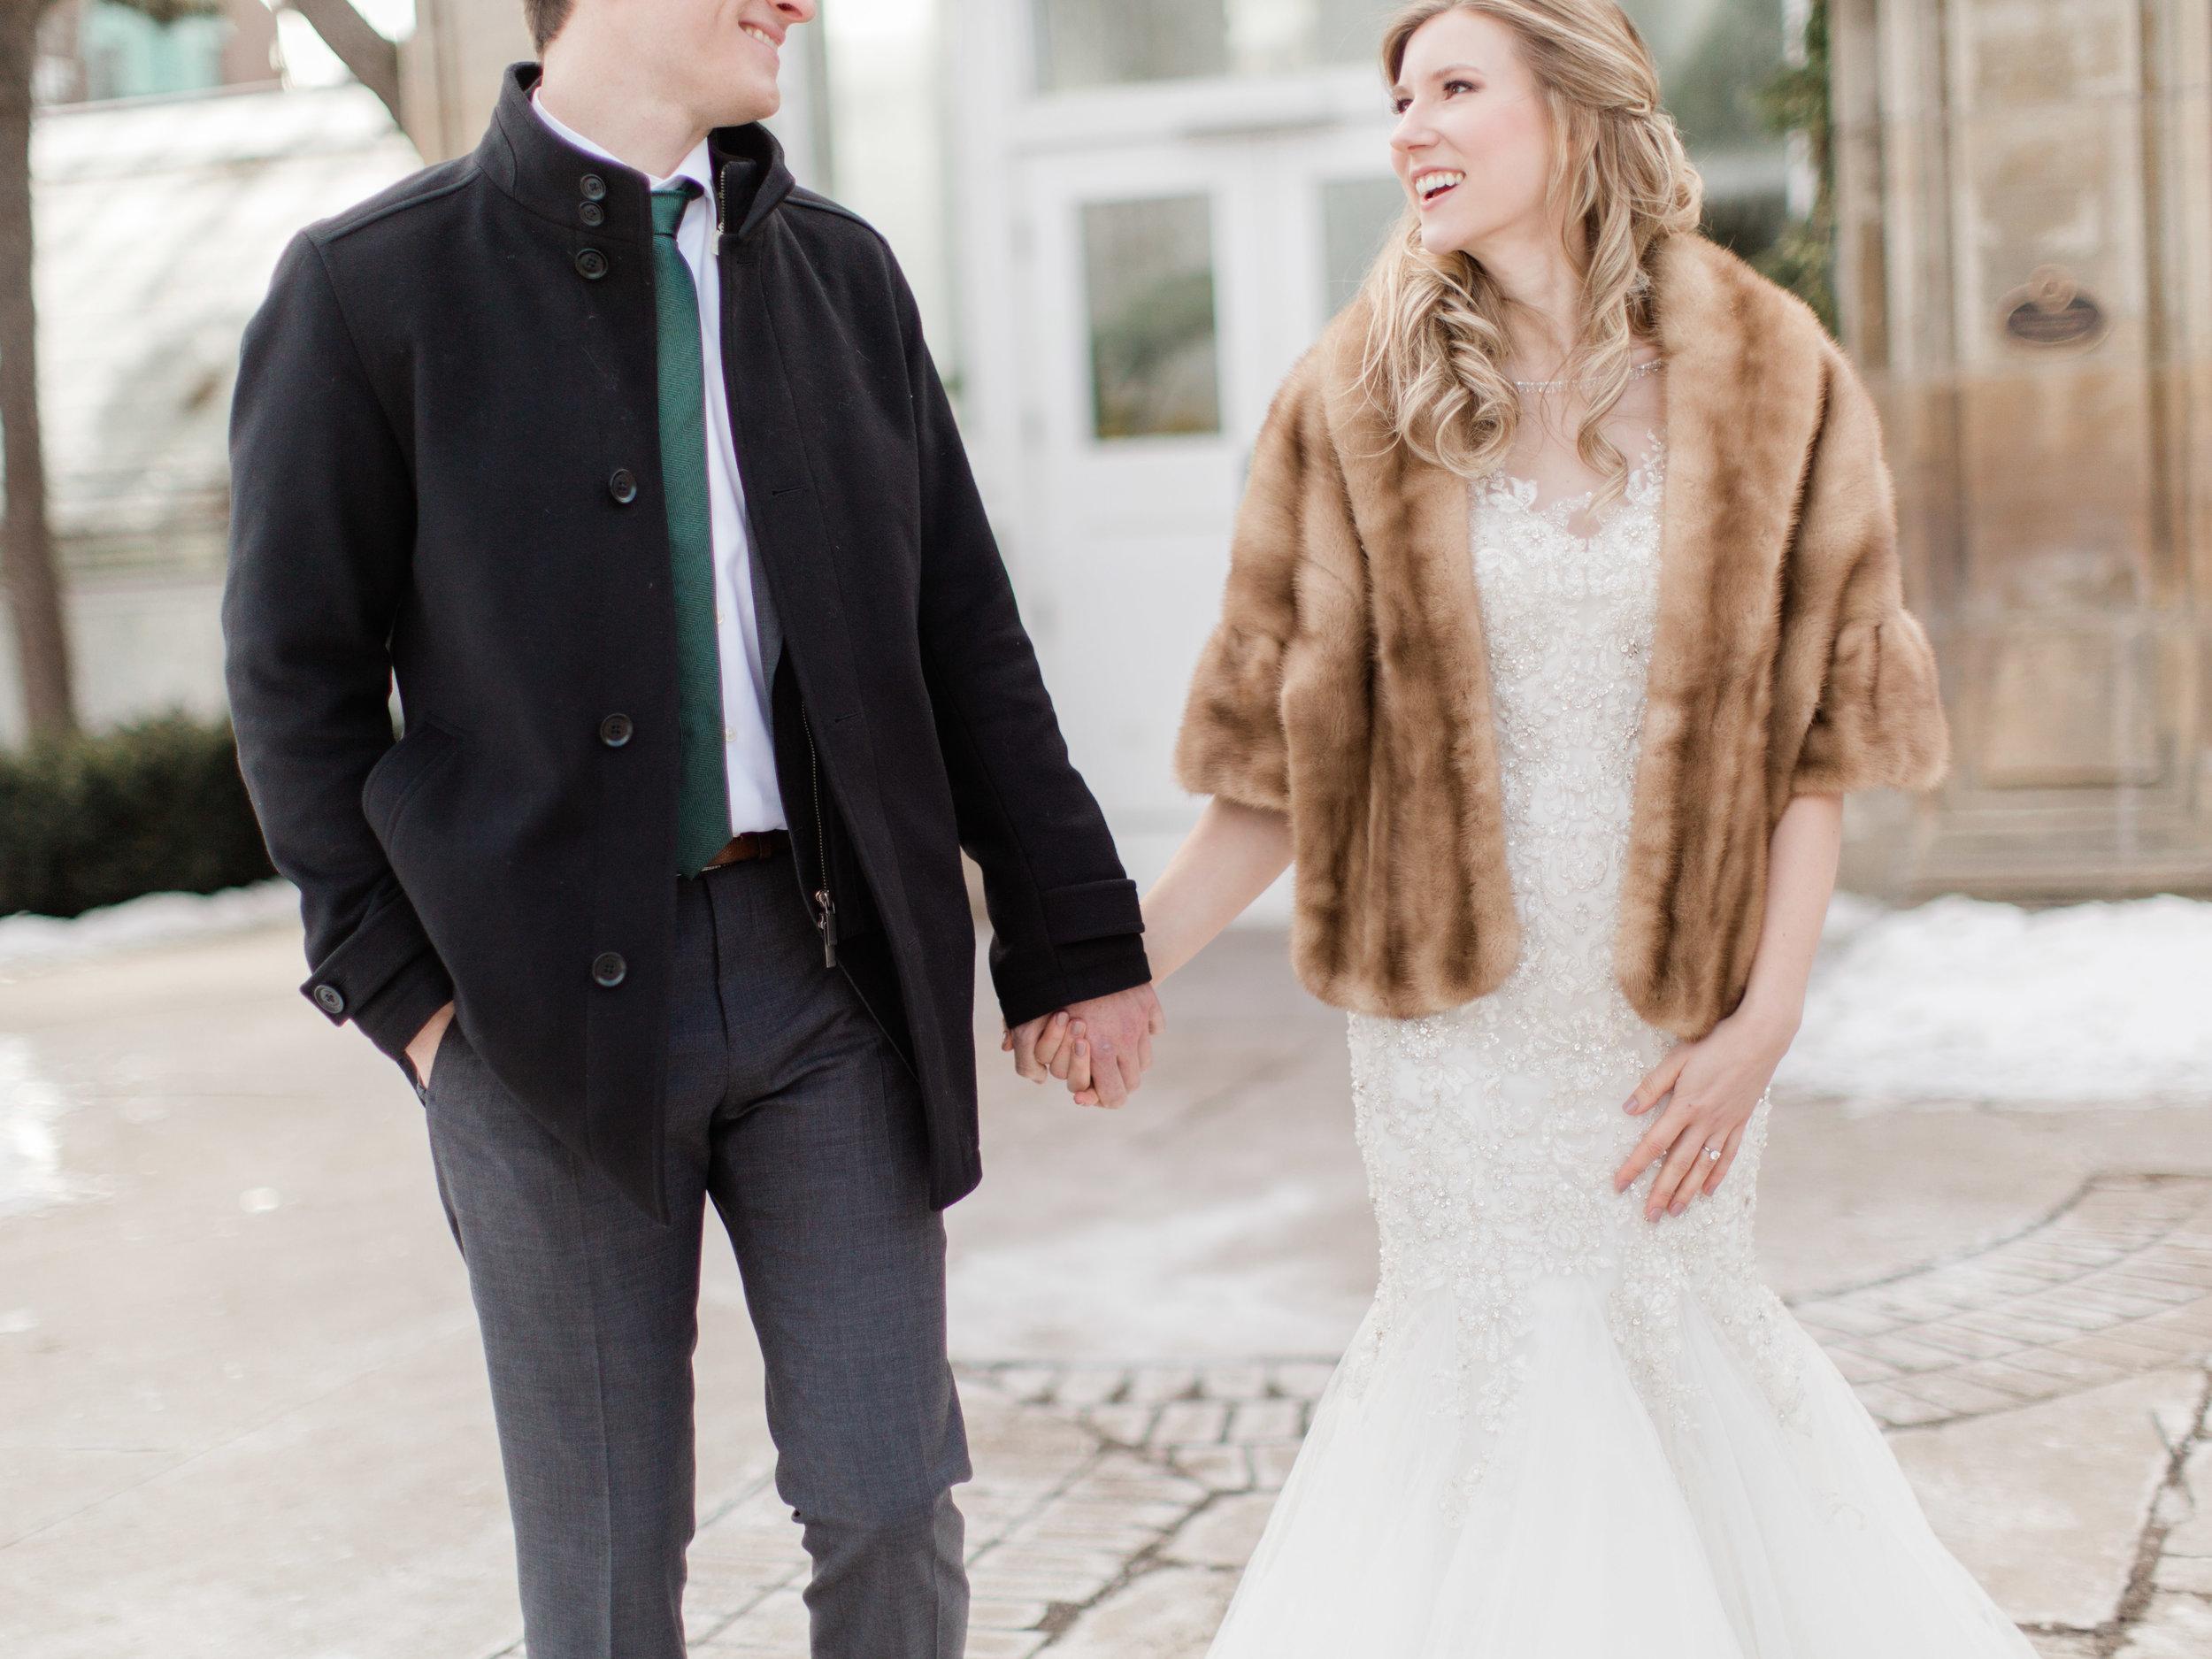 Toronto-wedding-photographer-downtown-winter-wedding-intimate-restaurant-canoe100.jpg